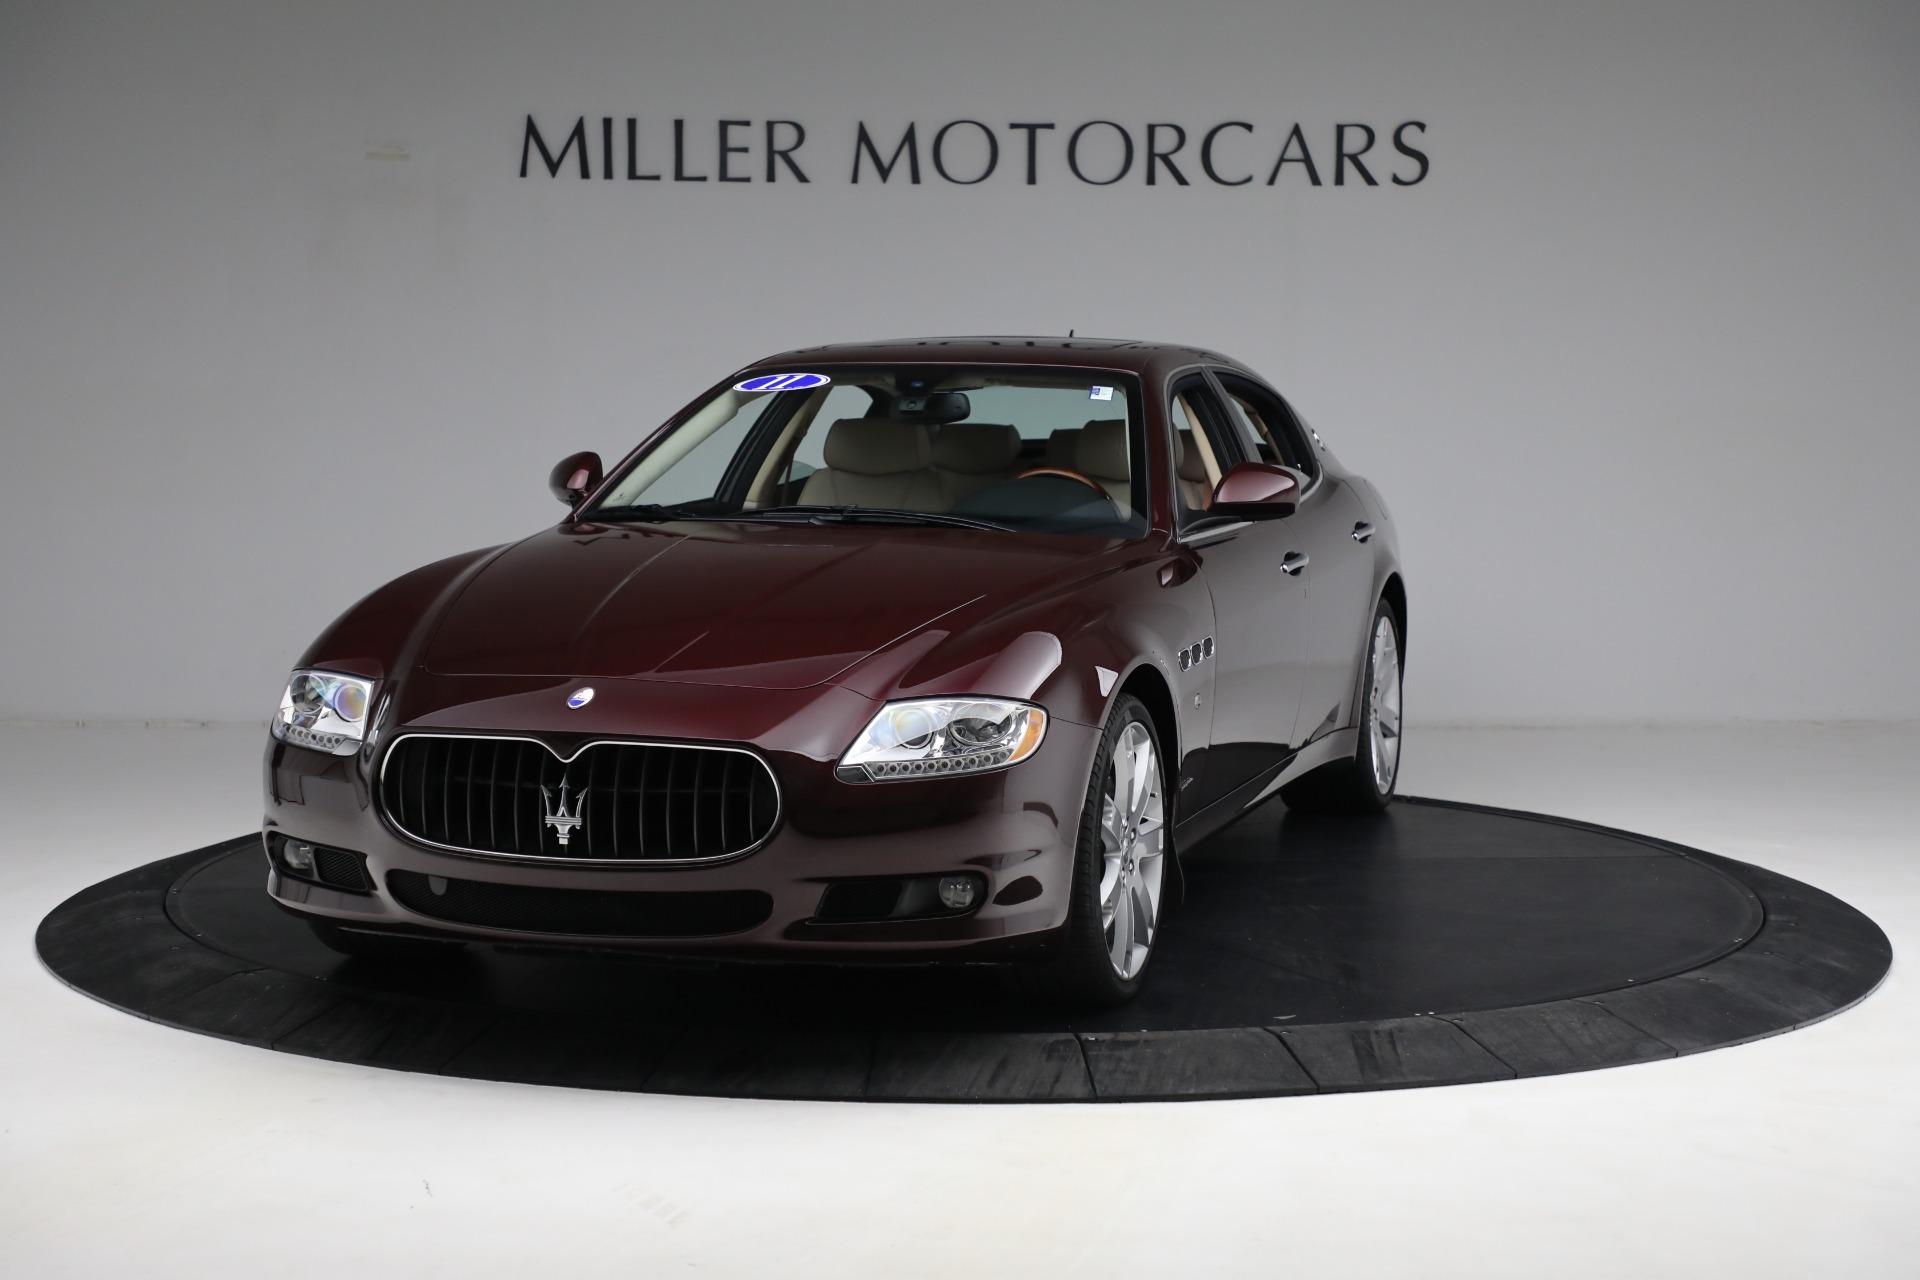 Used 2011 Maserati Quattroporte for sale $37,900 at McLaren Greenwich in Greenwich CT 06830 1